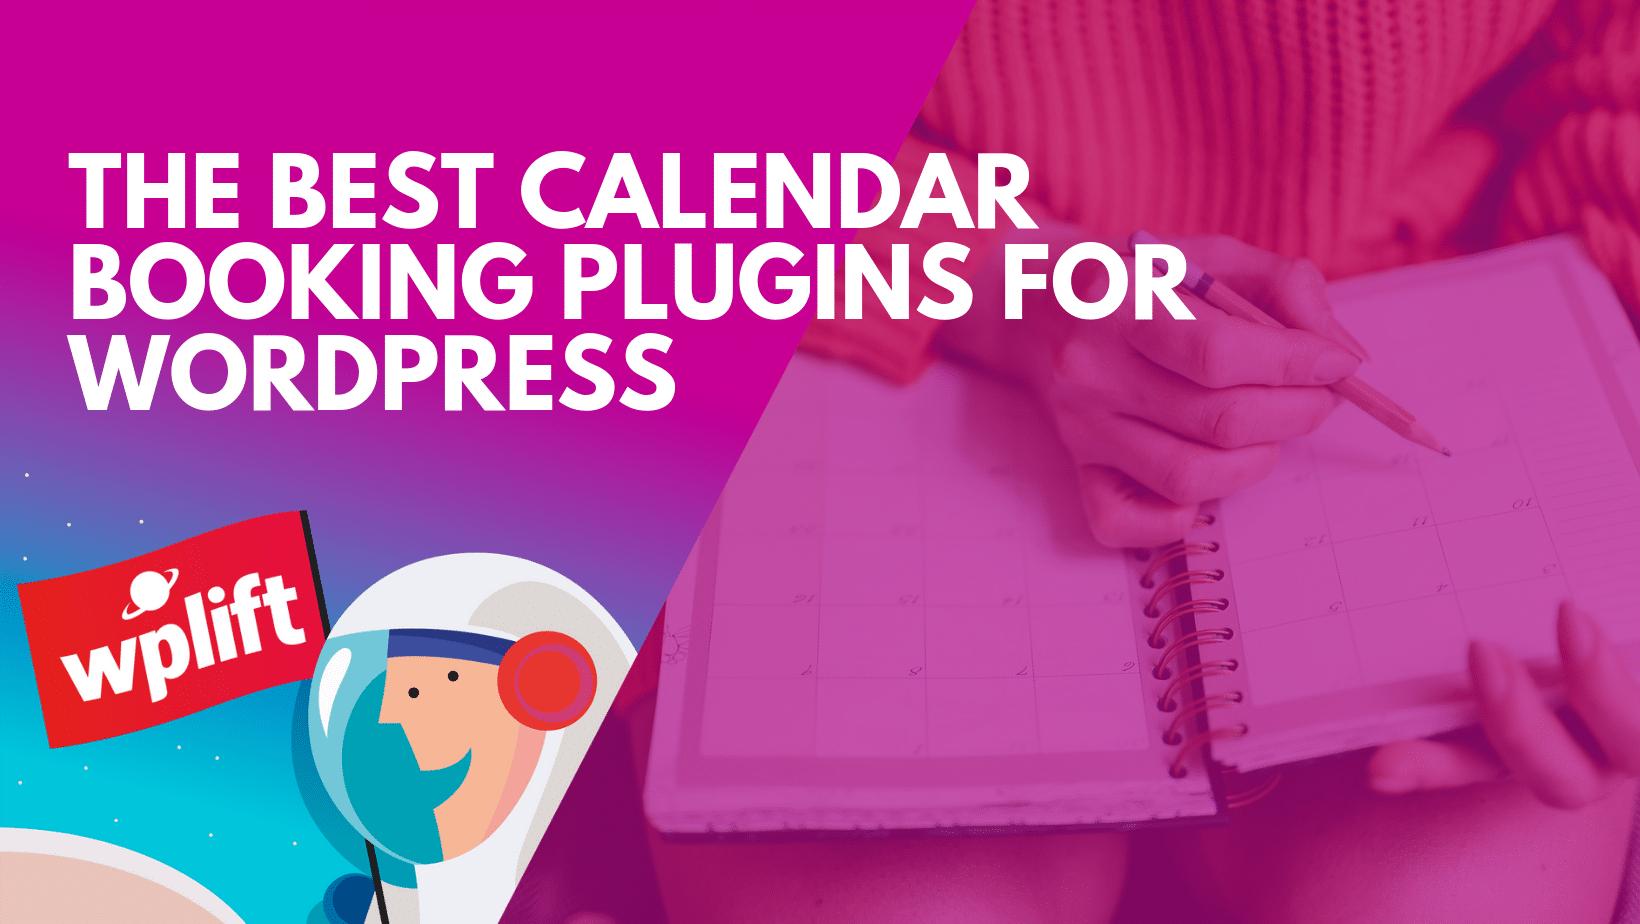 The Best Calendar Booking Plugins for WordPress